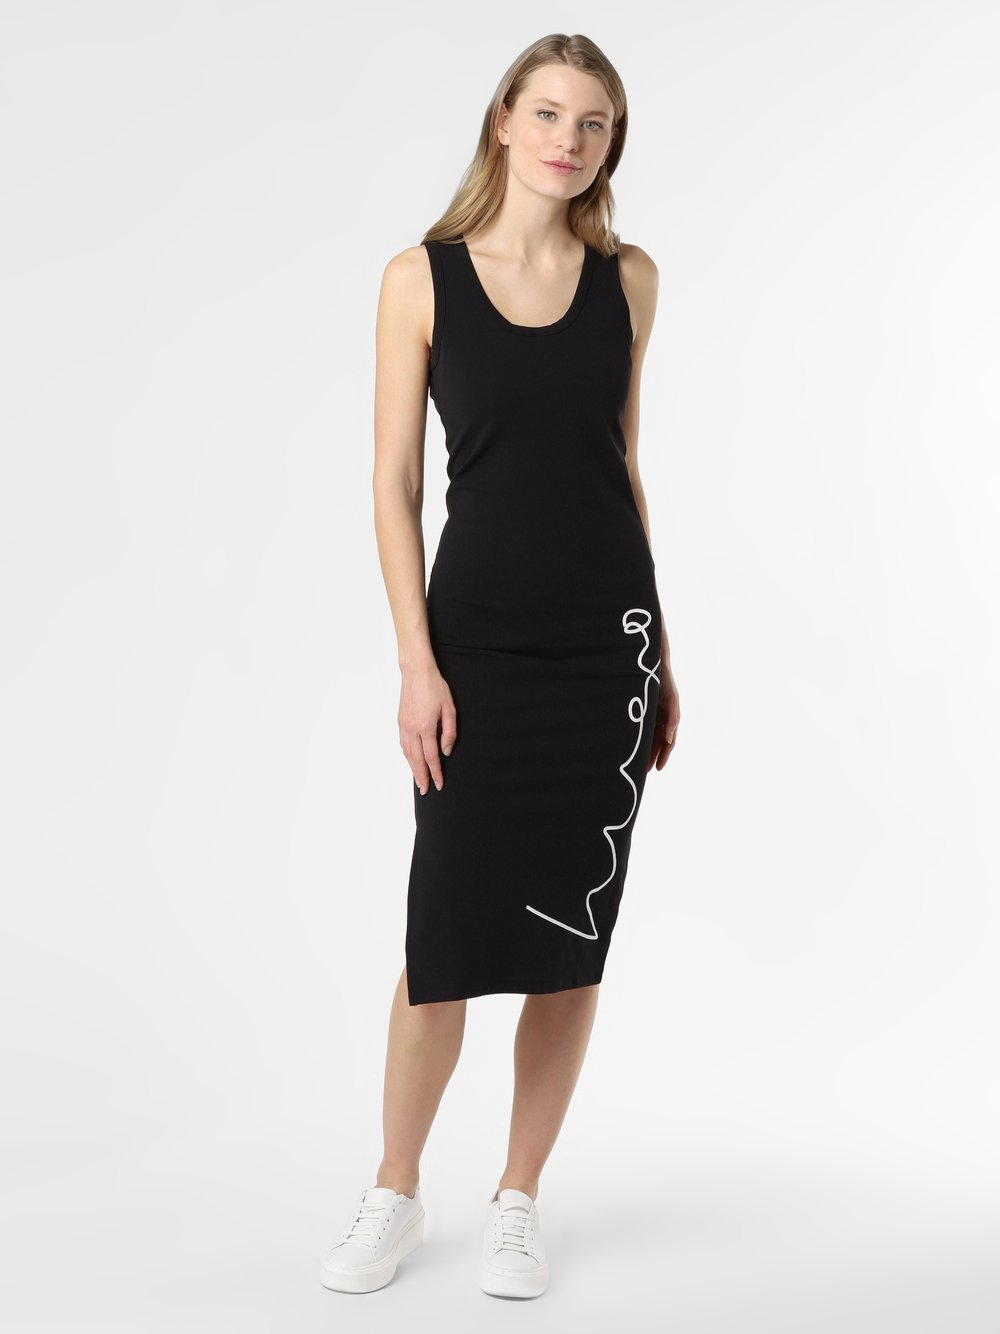 HUGO - Sukienka damska – Namadra, czarny